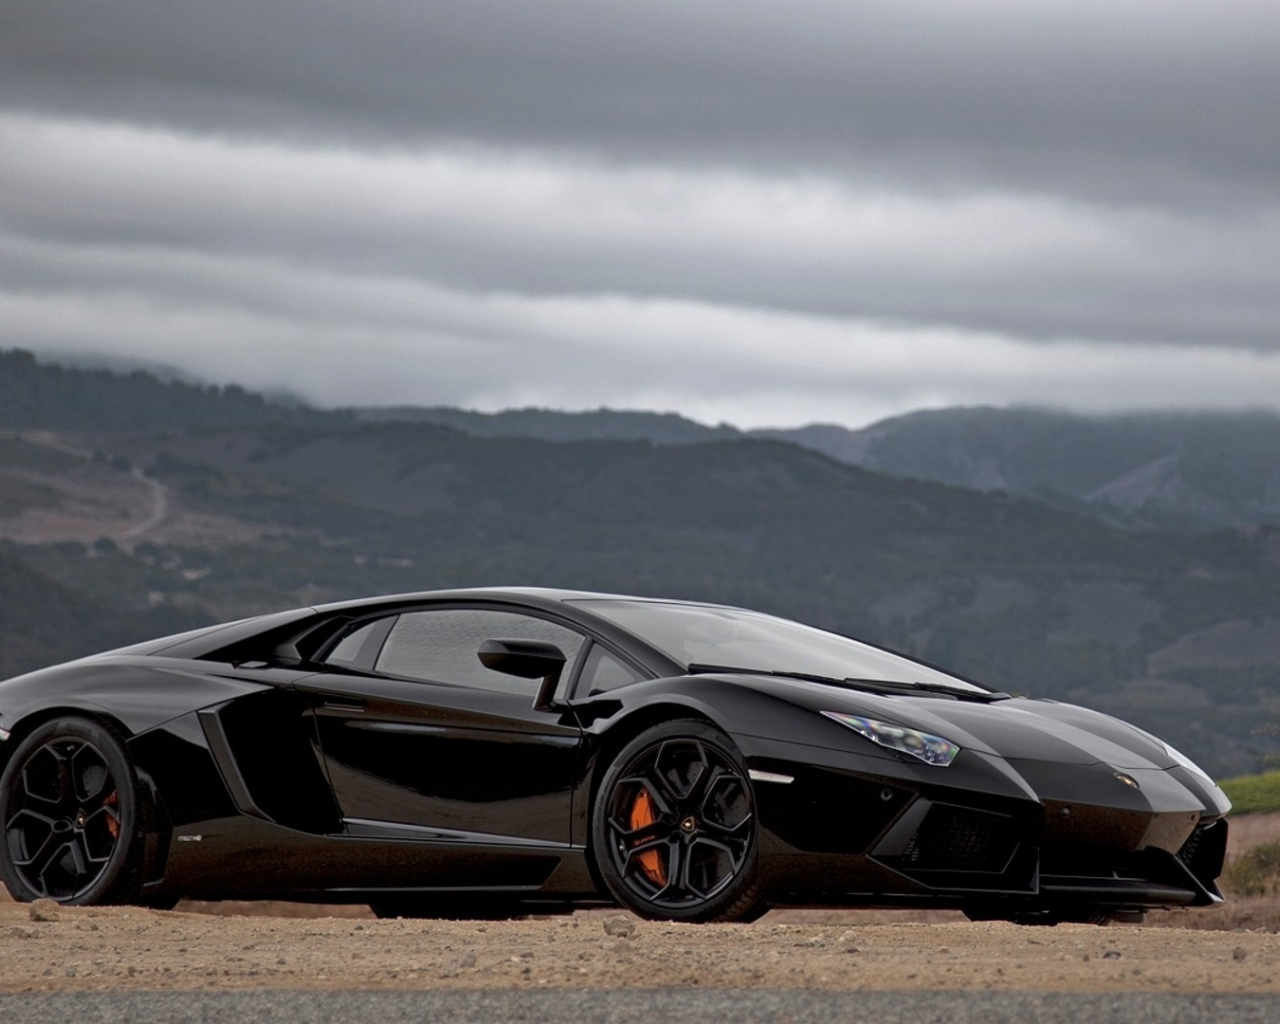 Free download Lamborghini Aventador Black 1080p HD ...